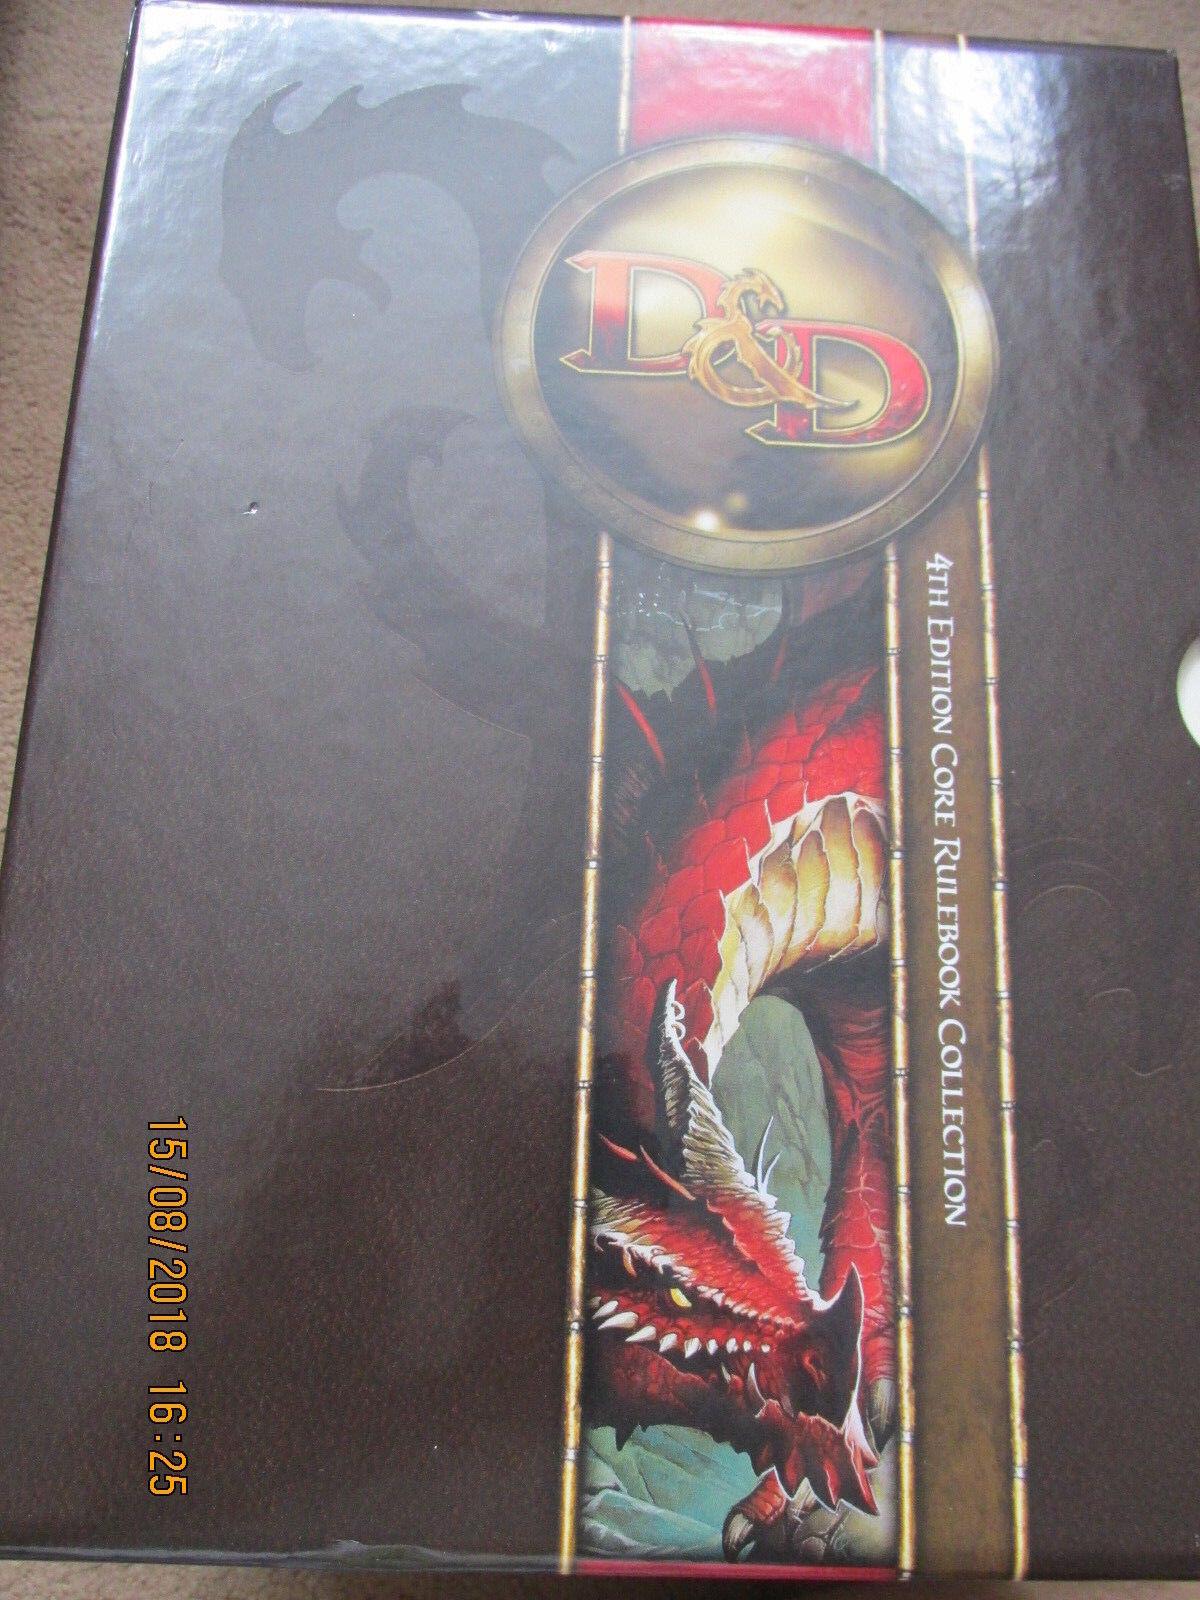 WOTC D&D D20 4E CORE RULES BOXED PHB DMG MM  DUNGEON DRAGON VGC RPG